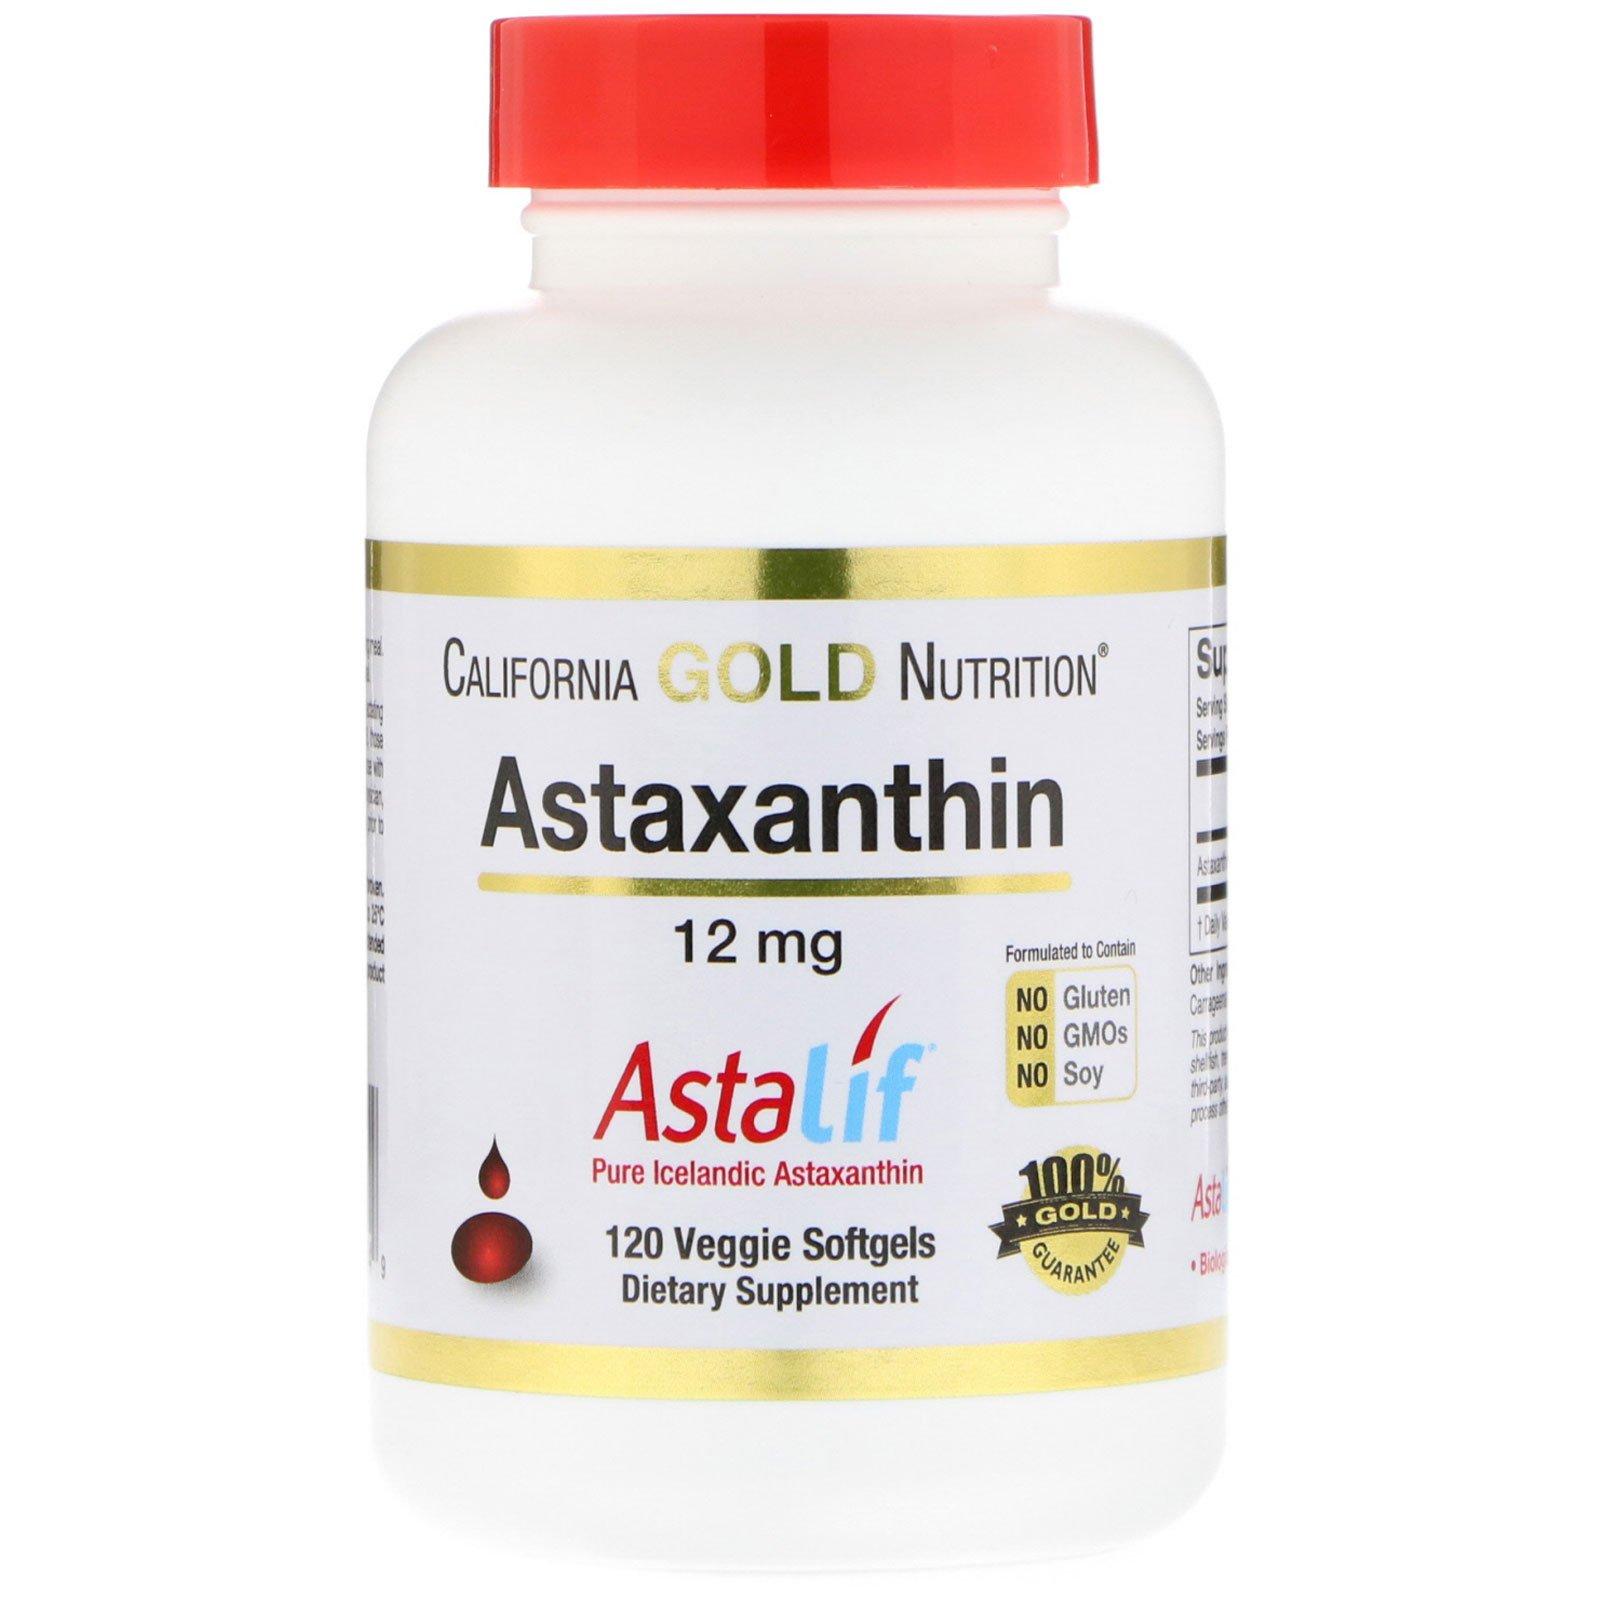 California Gold Nutrition, Astaxanthin, Astalif, 12 mg, 120 Veggie Softgels